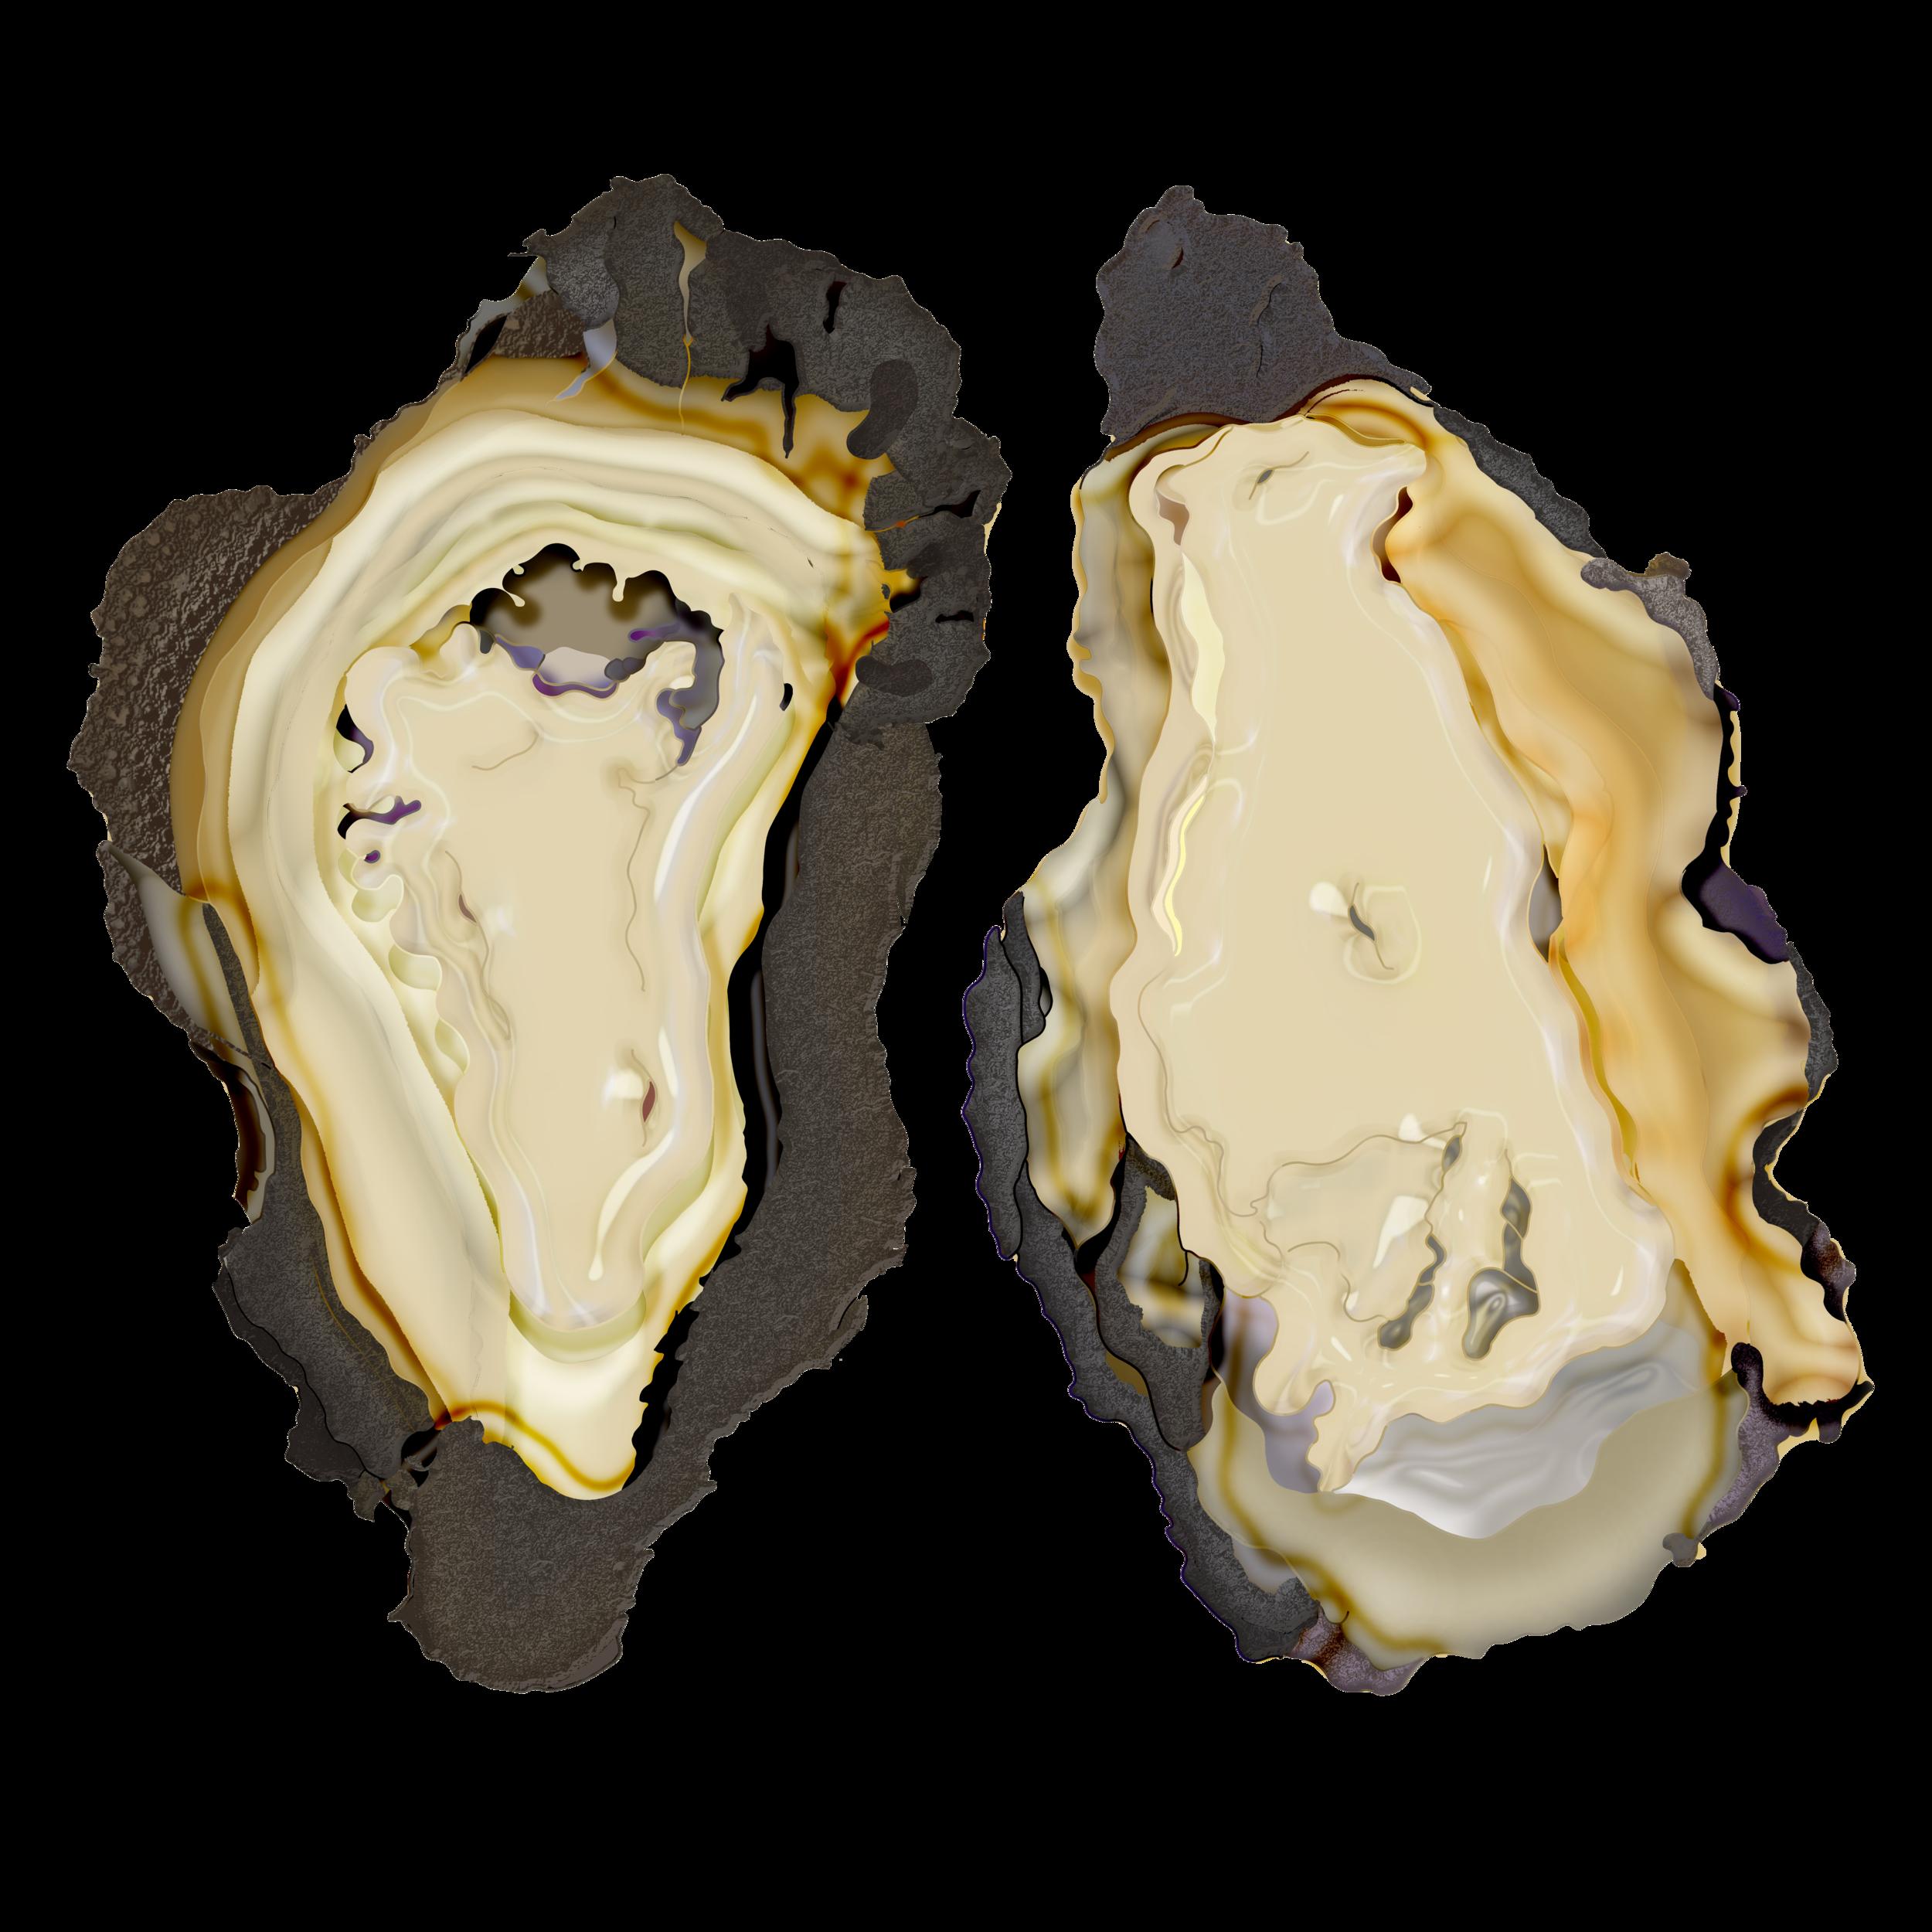 oyster mergedd.png